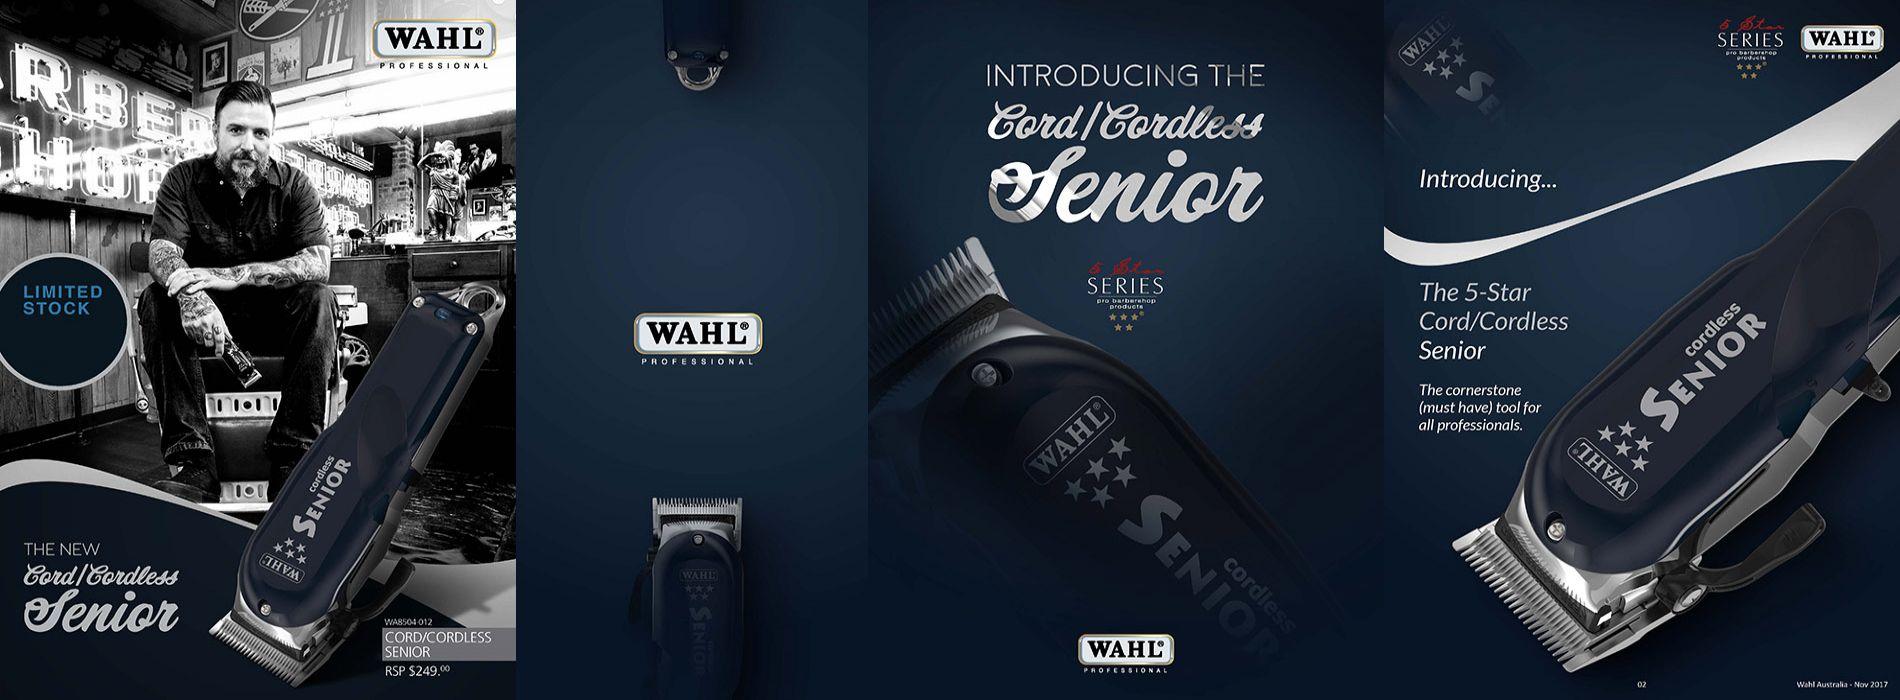 wahl-5-star-senior-cord-cordless-professional-hair-clipper-8504-012.html